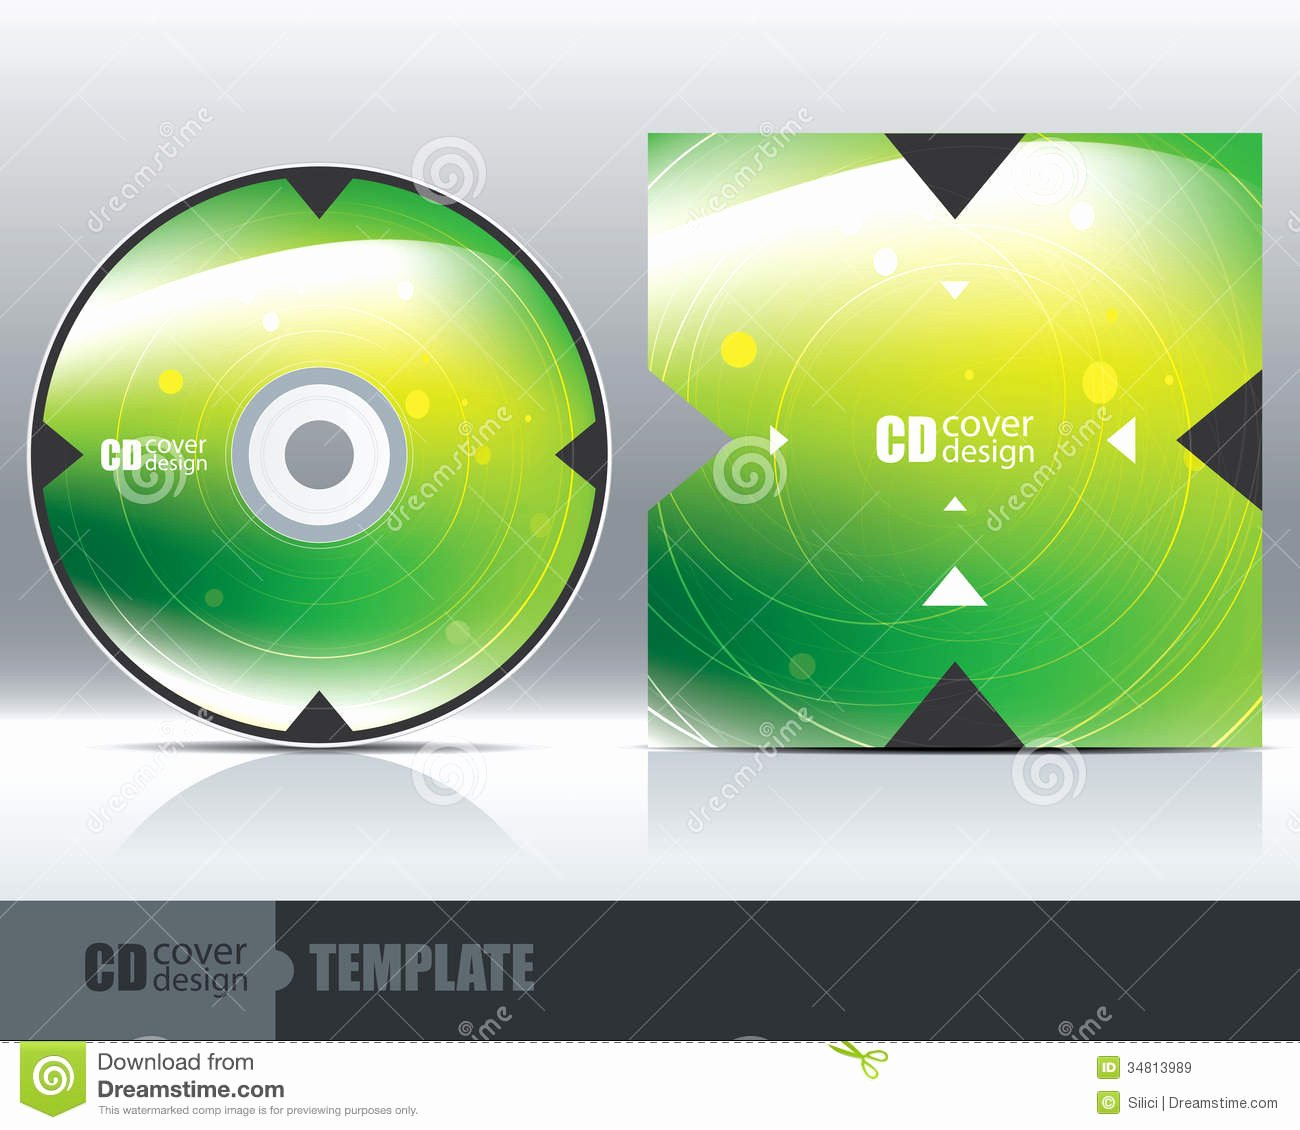 Cd Cover Design Template Set 1 Stock Vector Illustration